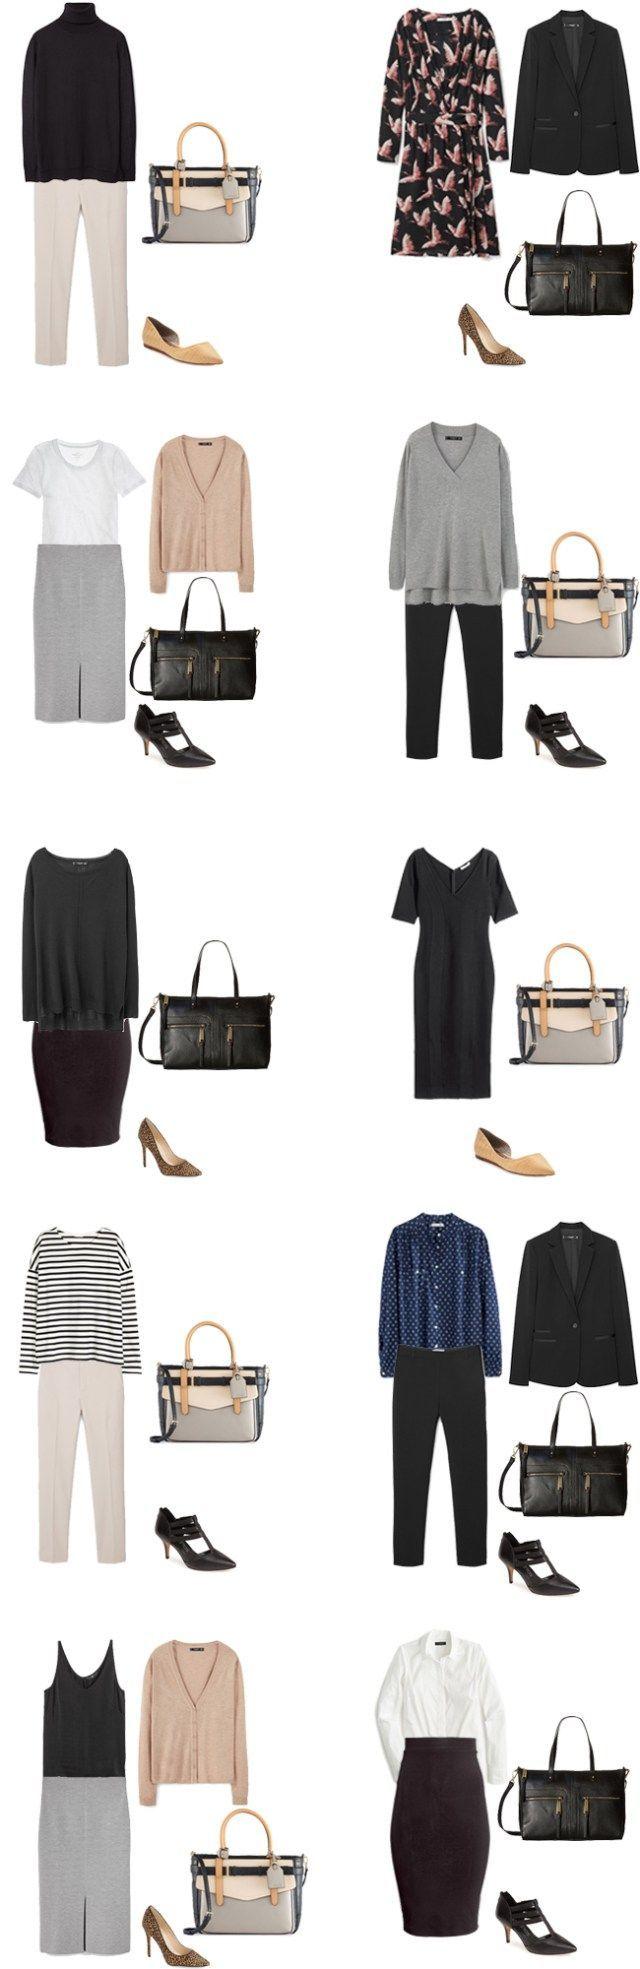 Basic Work Capsule Outfits 11-20 #capsulewardrobe #workwardrobe #workwear #capsule